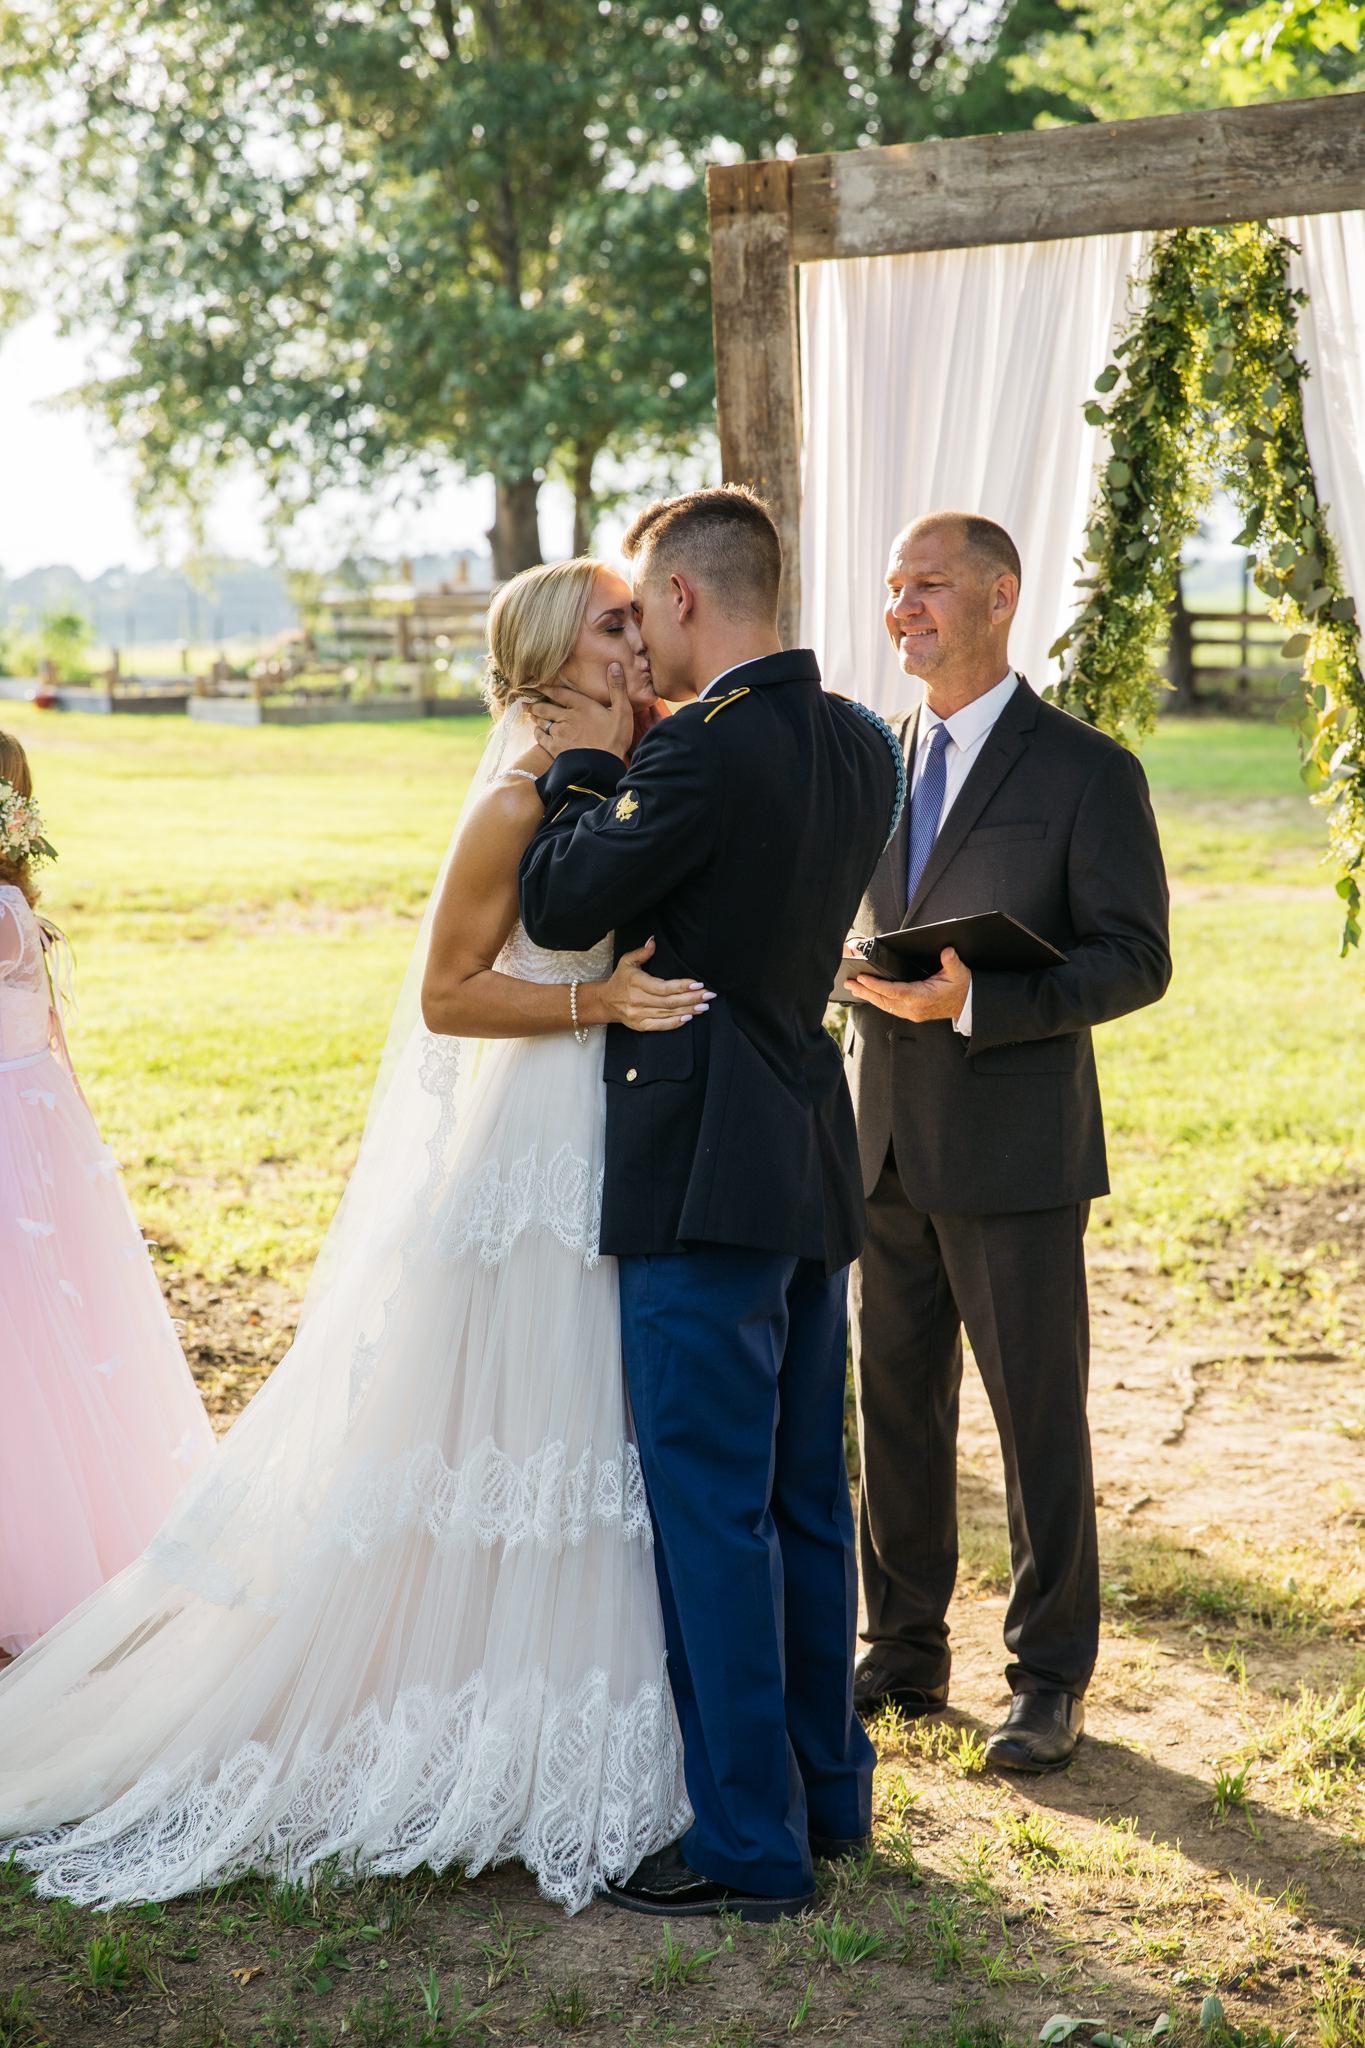 backyard-wedding-thewarmtharoundyou-lexy-branson-4.jpg